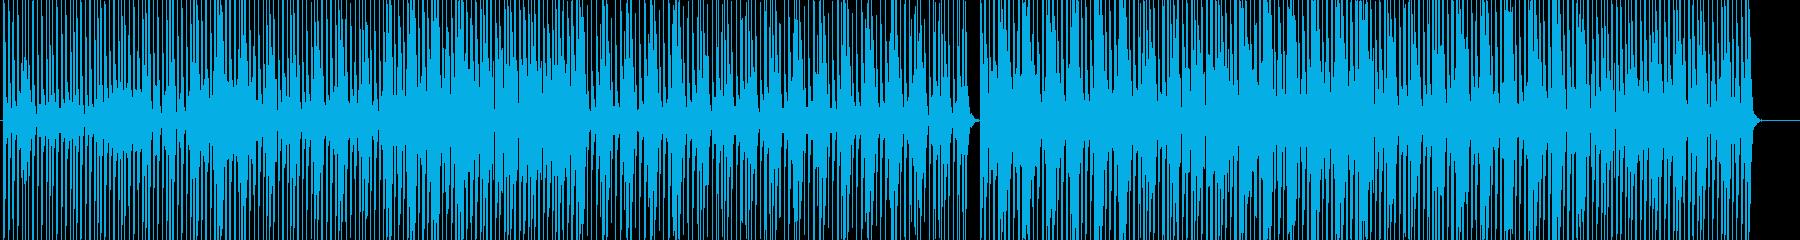 WAVE 16bit 44.1khzの再生済みの波形